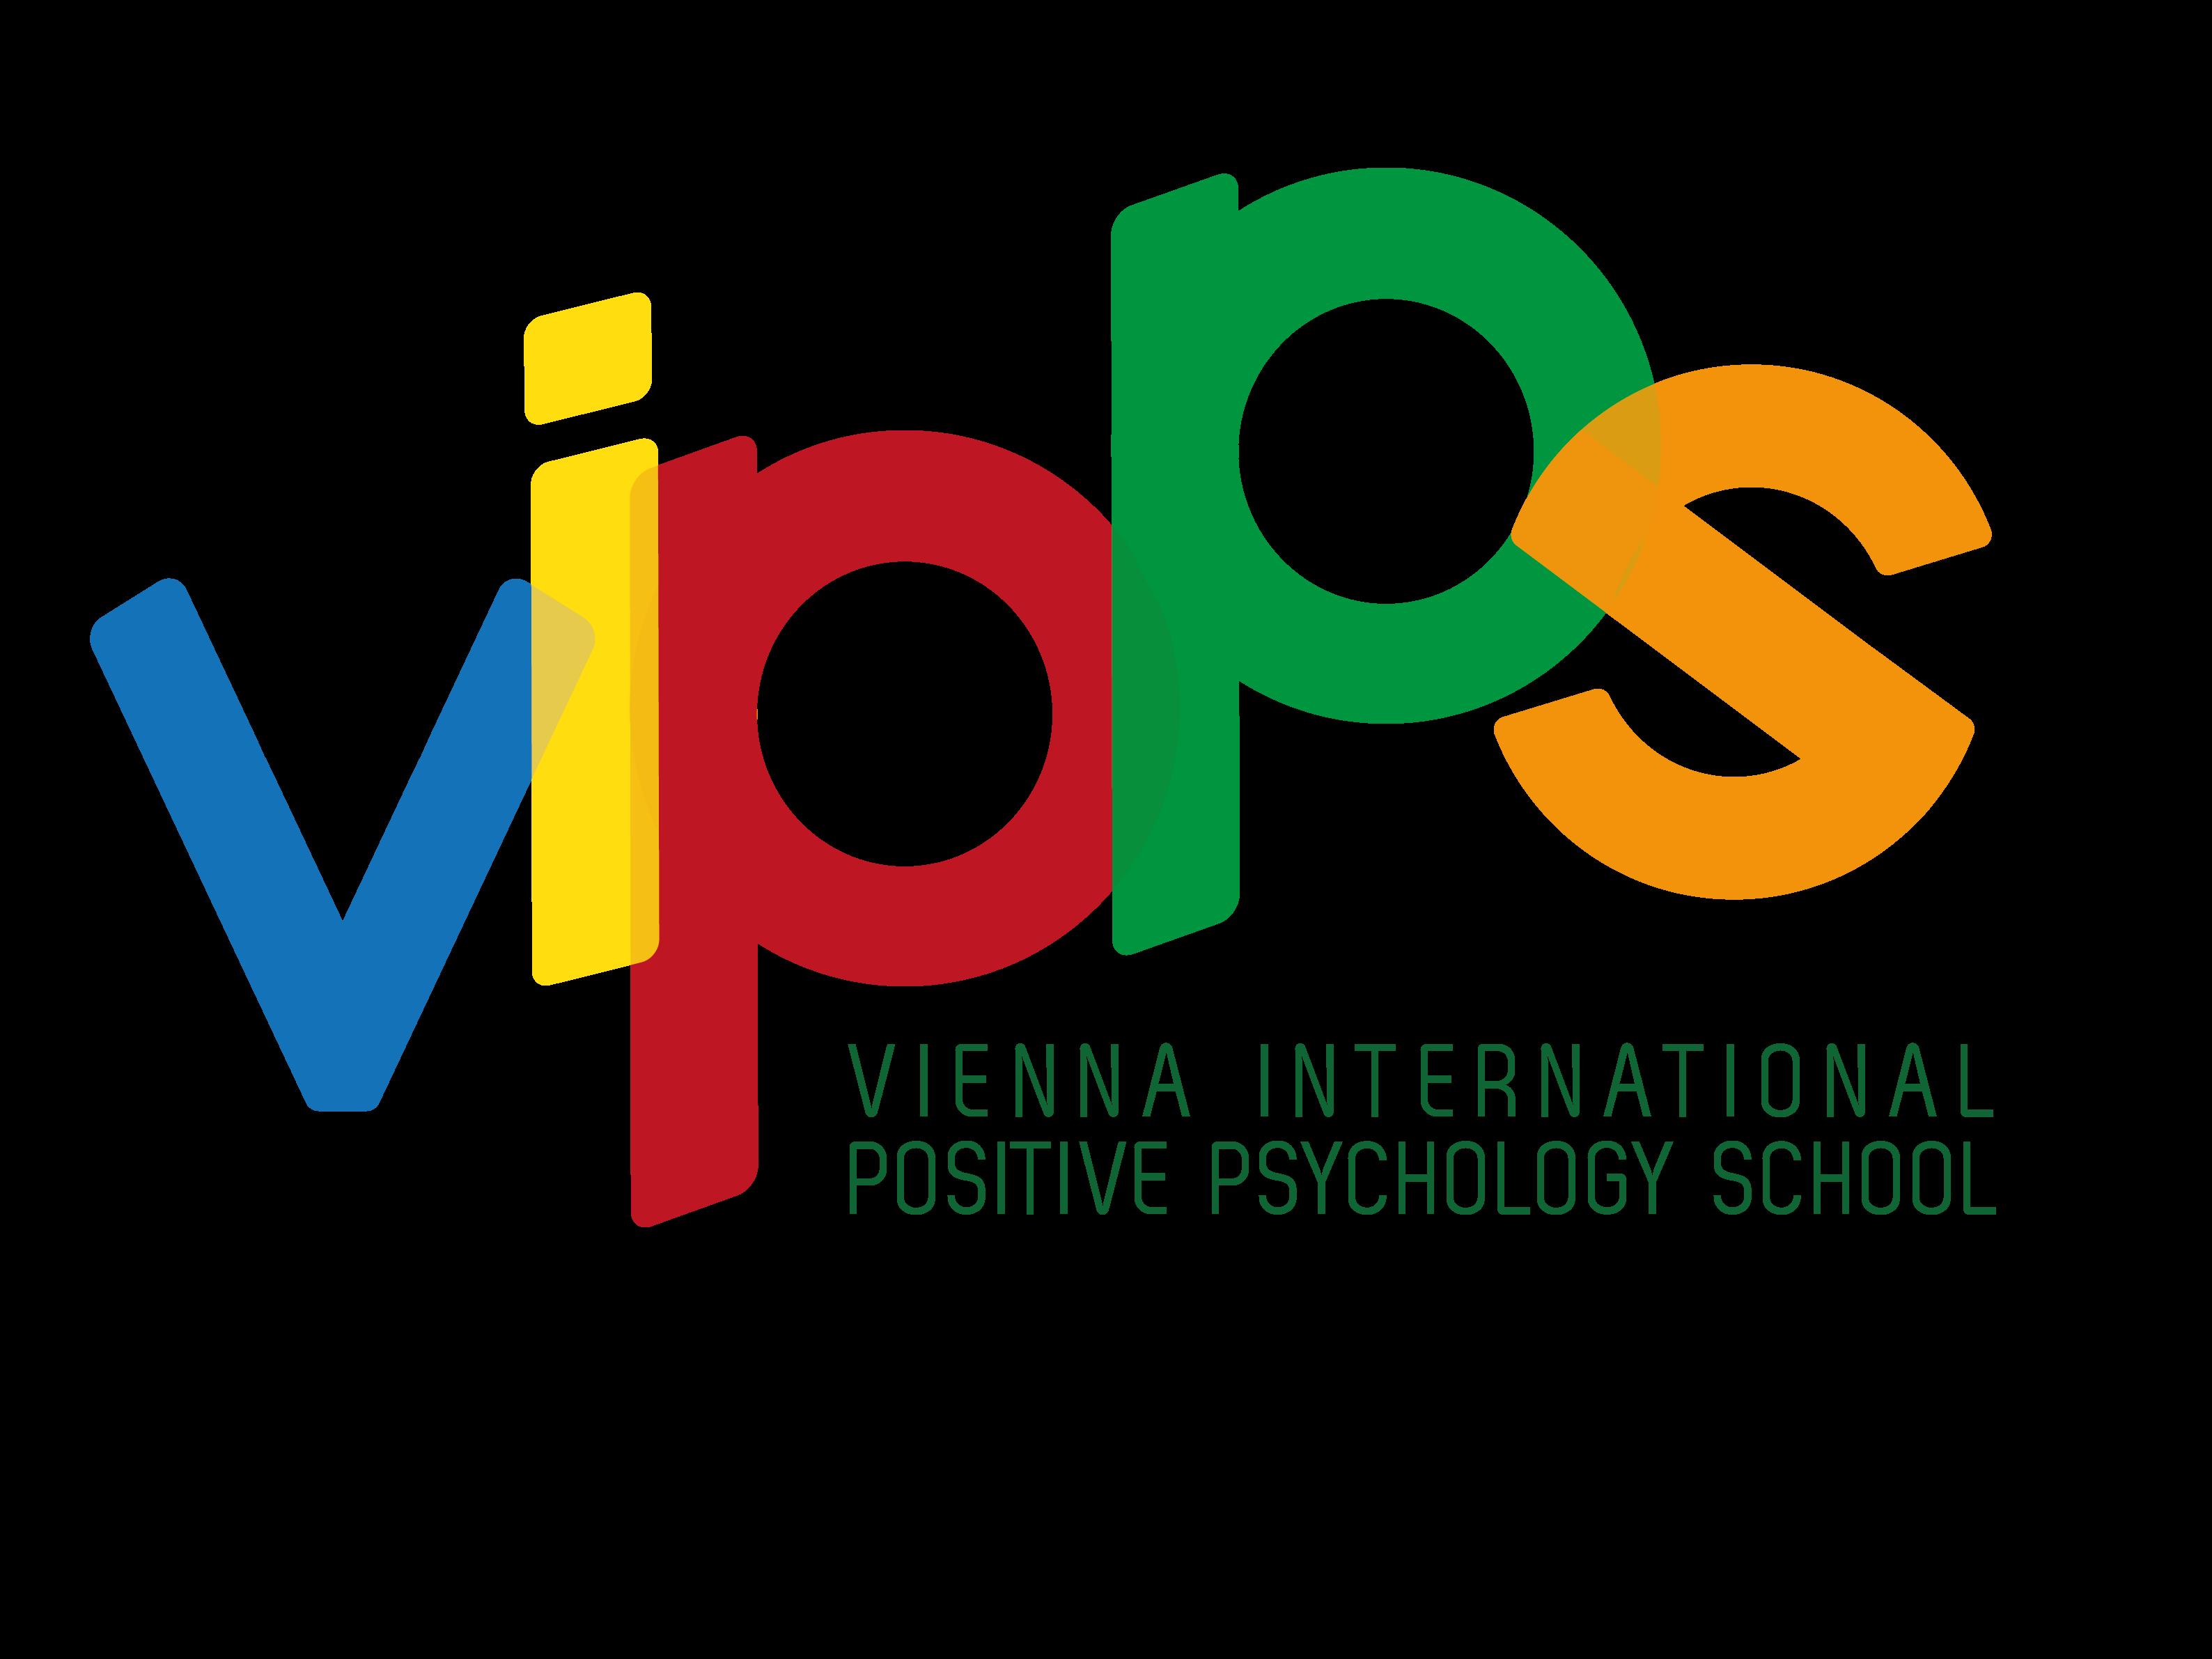 Vienna International Positive Psychology School